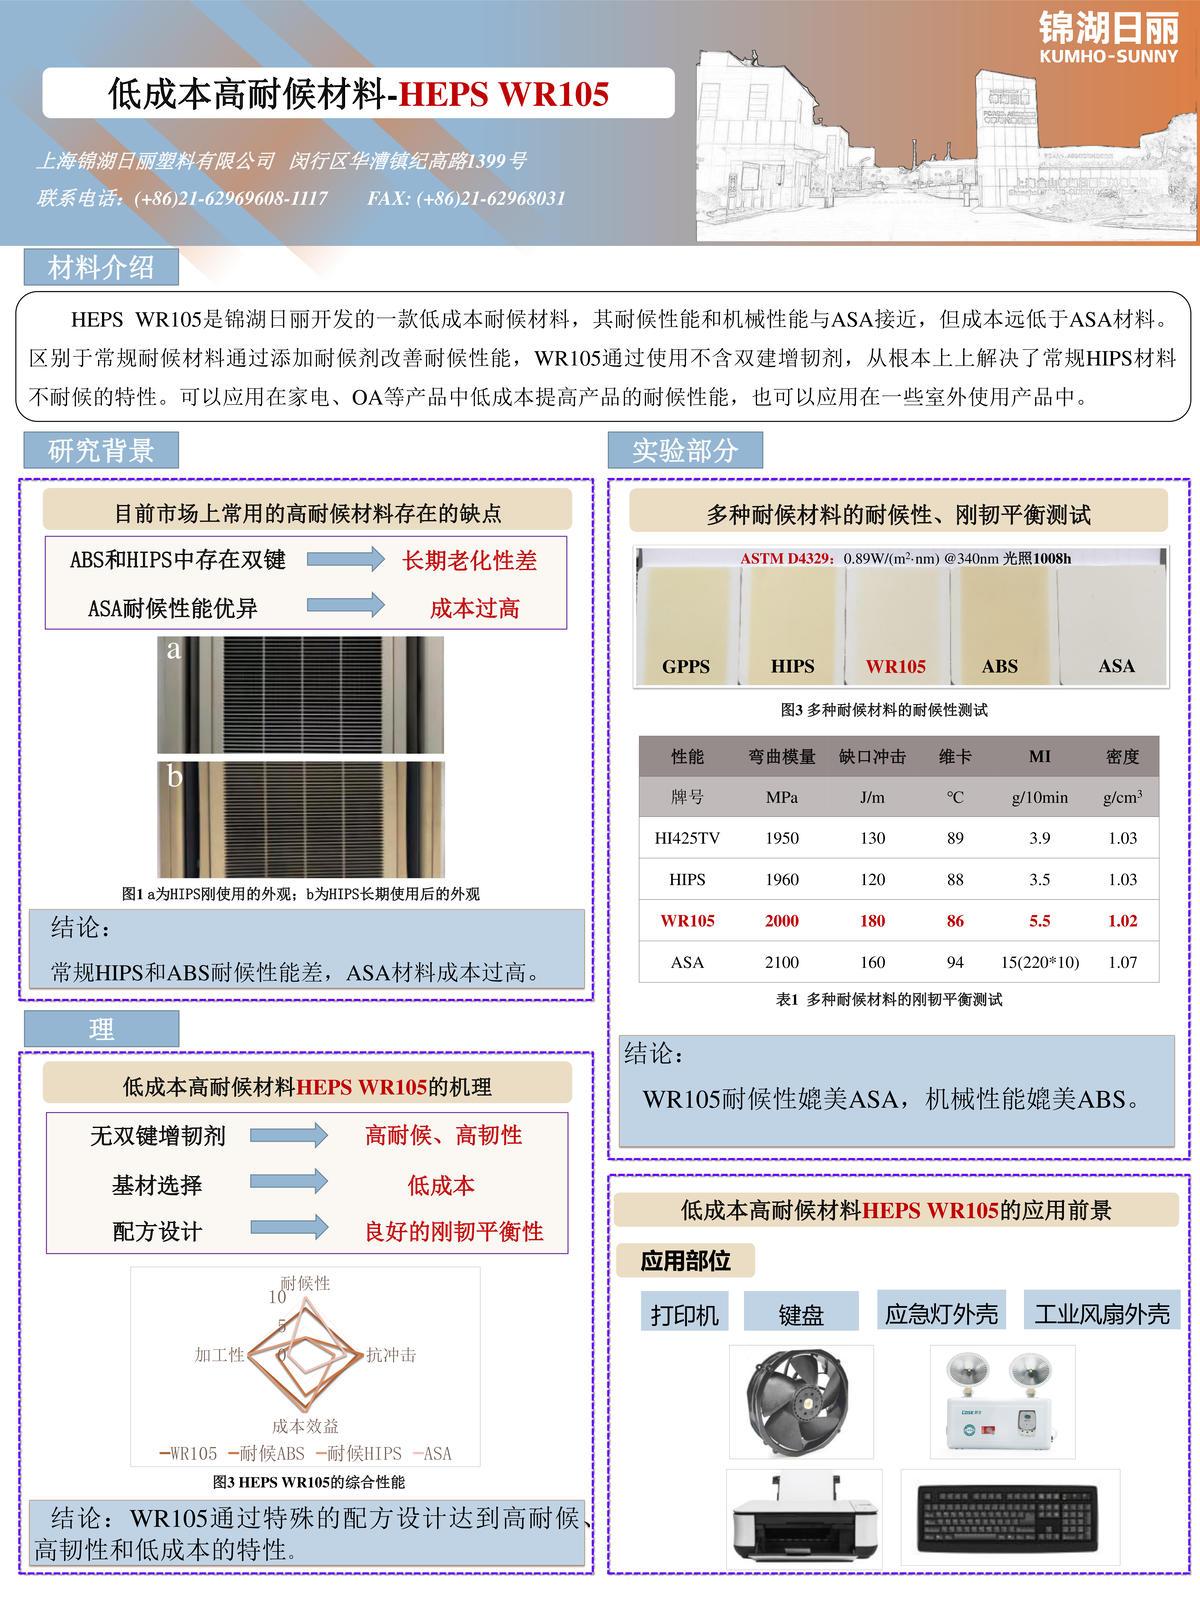 低成本高耐候材料 HEPS WR105